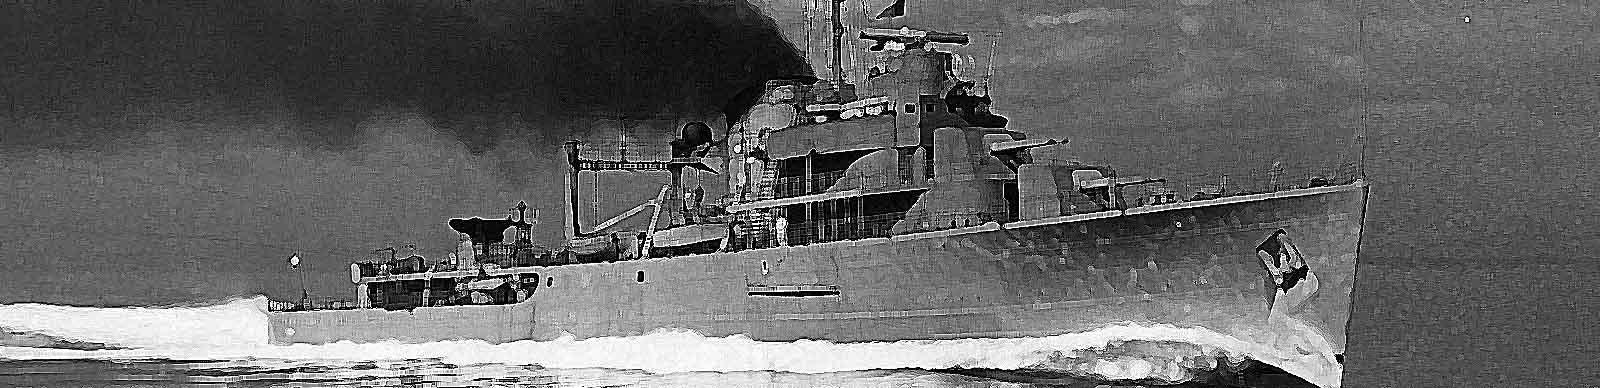 Tromp Class Cruisers (1937)